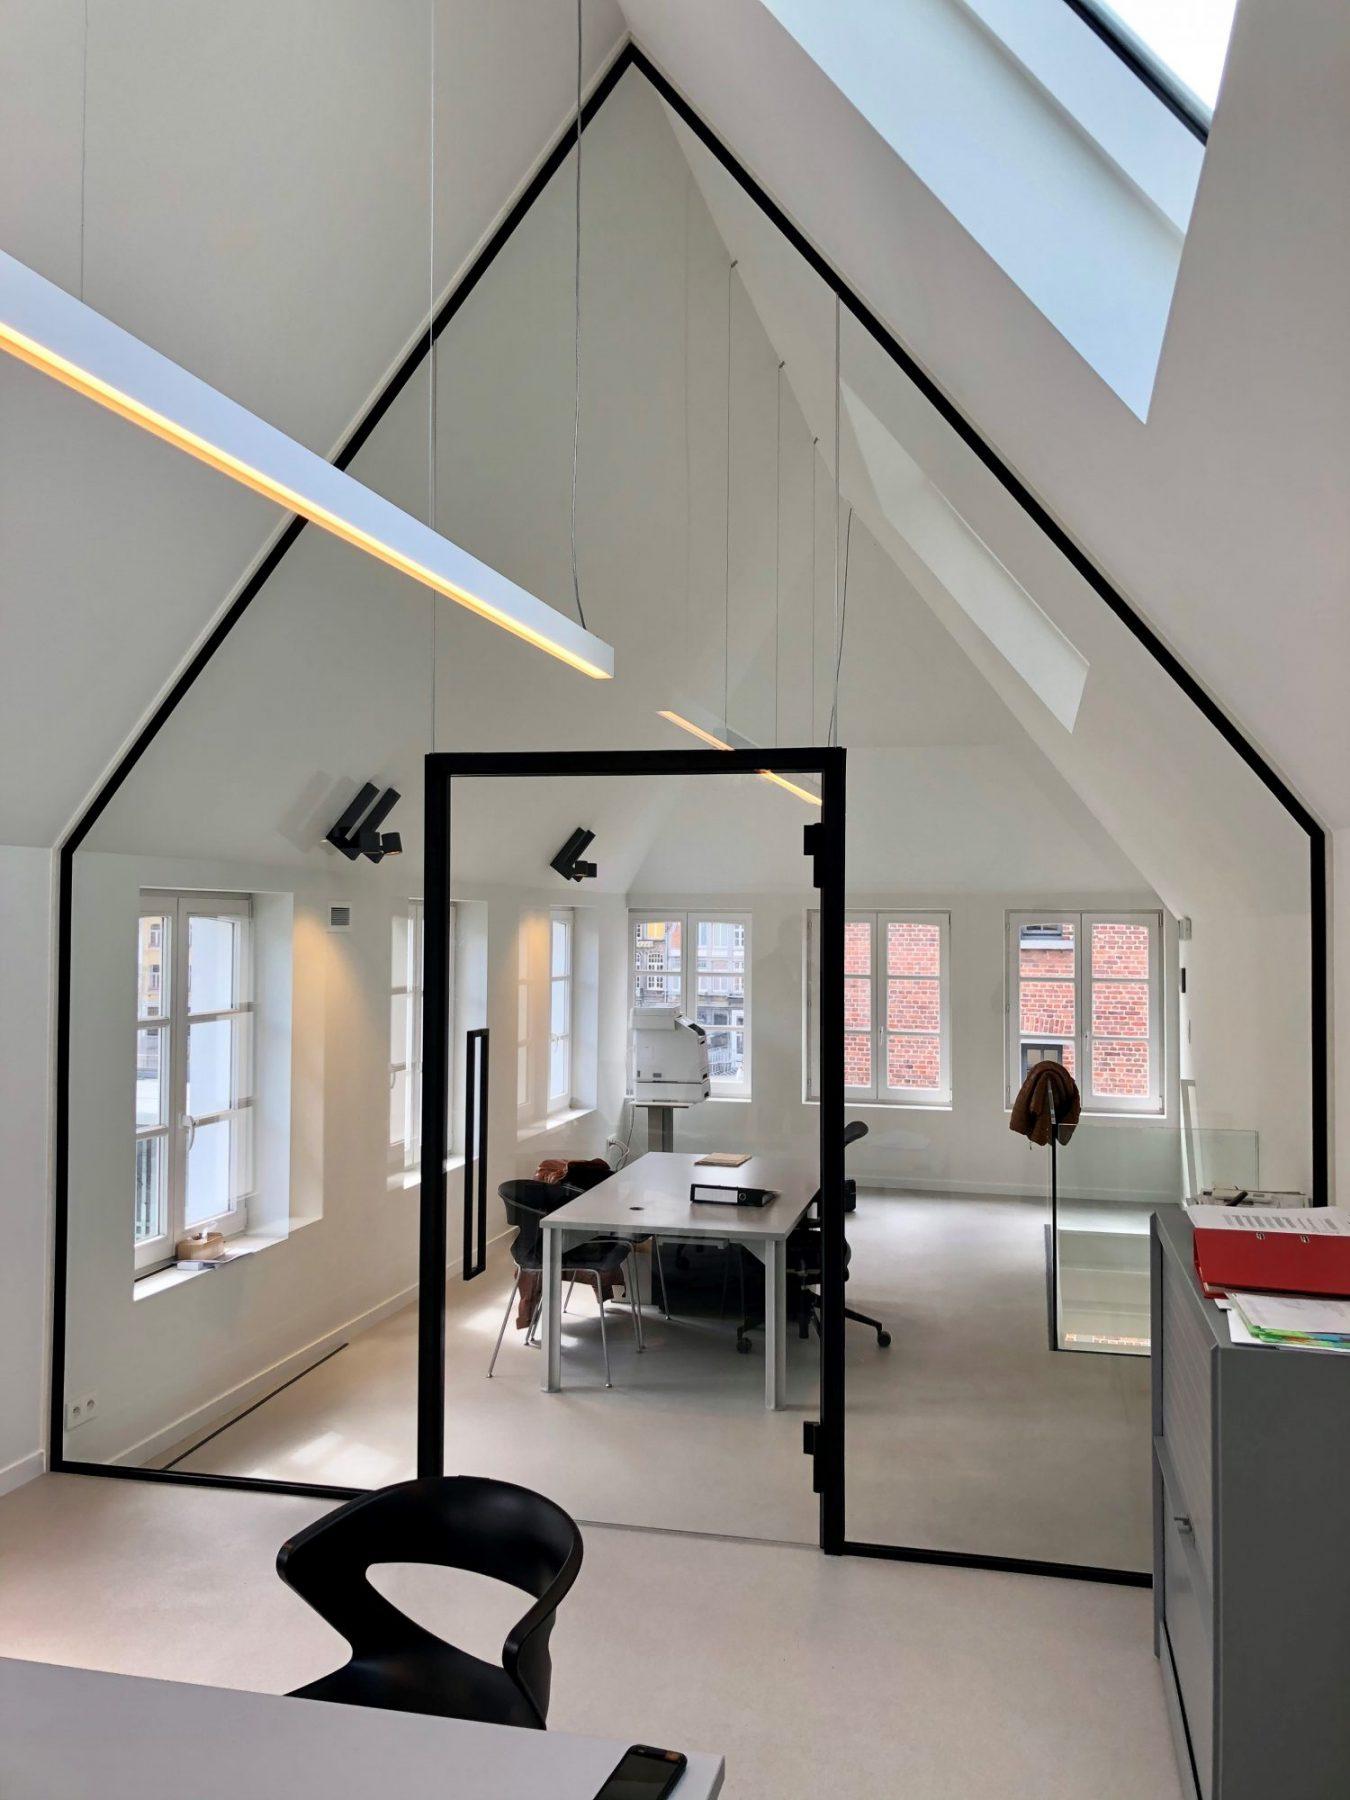 https://allglas.be/wp-content/uploads/2021/06/all-glas-walschaerts-bonheiden-interieurglas-steellook-glaswand-immovos-02-scaled.jpg